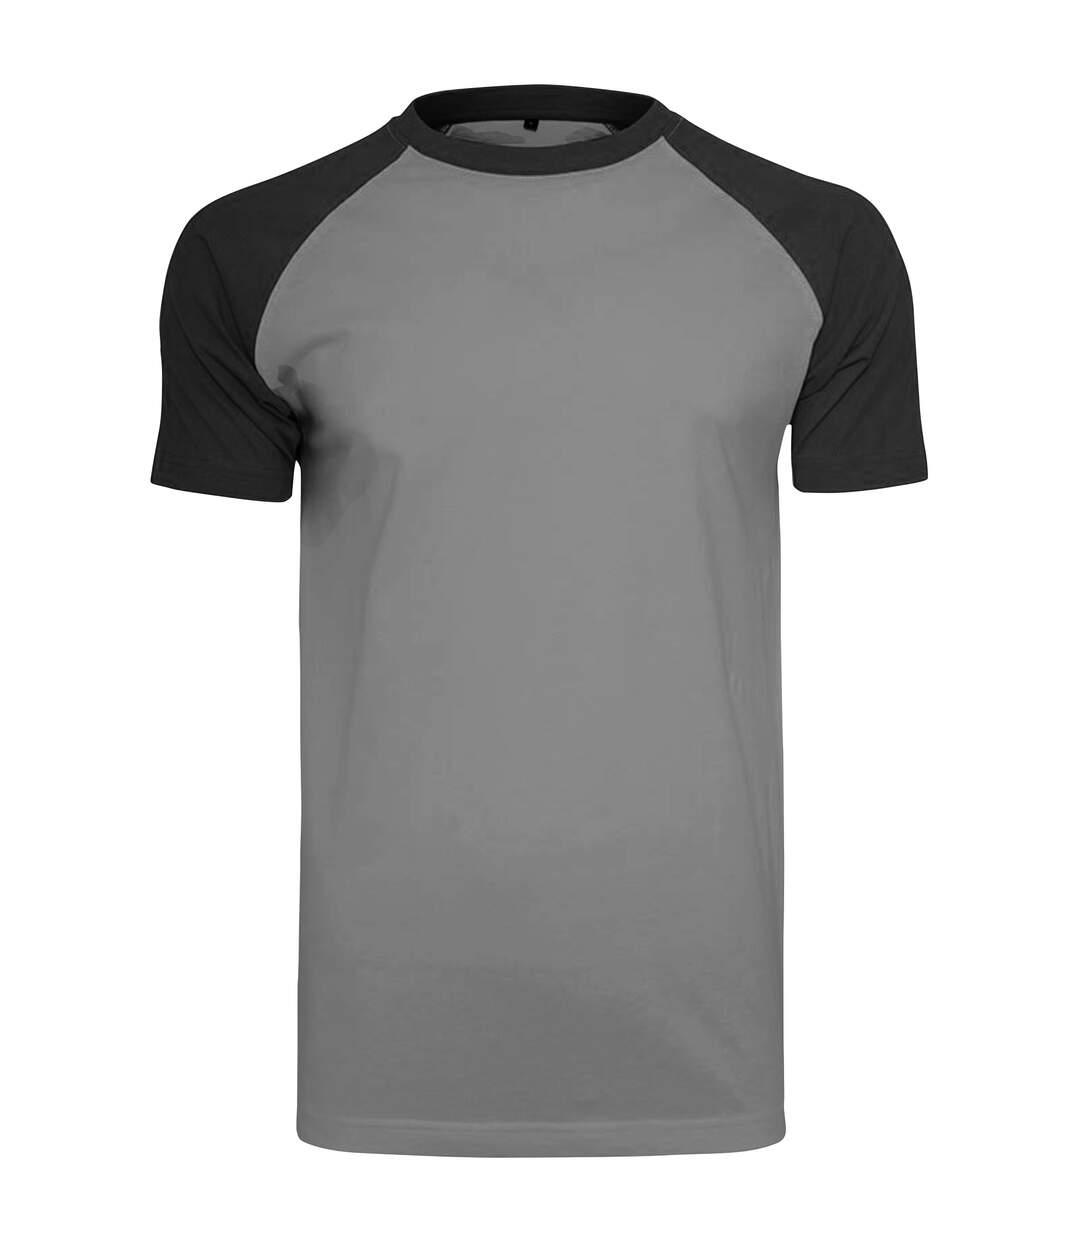 Build Your Brand Mens Raglan Contrast Short Sleeve T-Shirt (Charcoal/Black) - UTRW5683